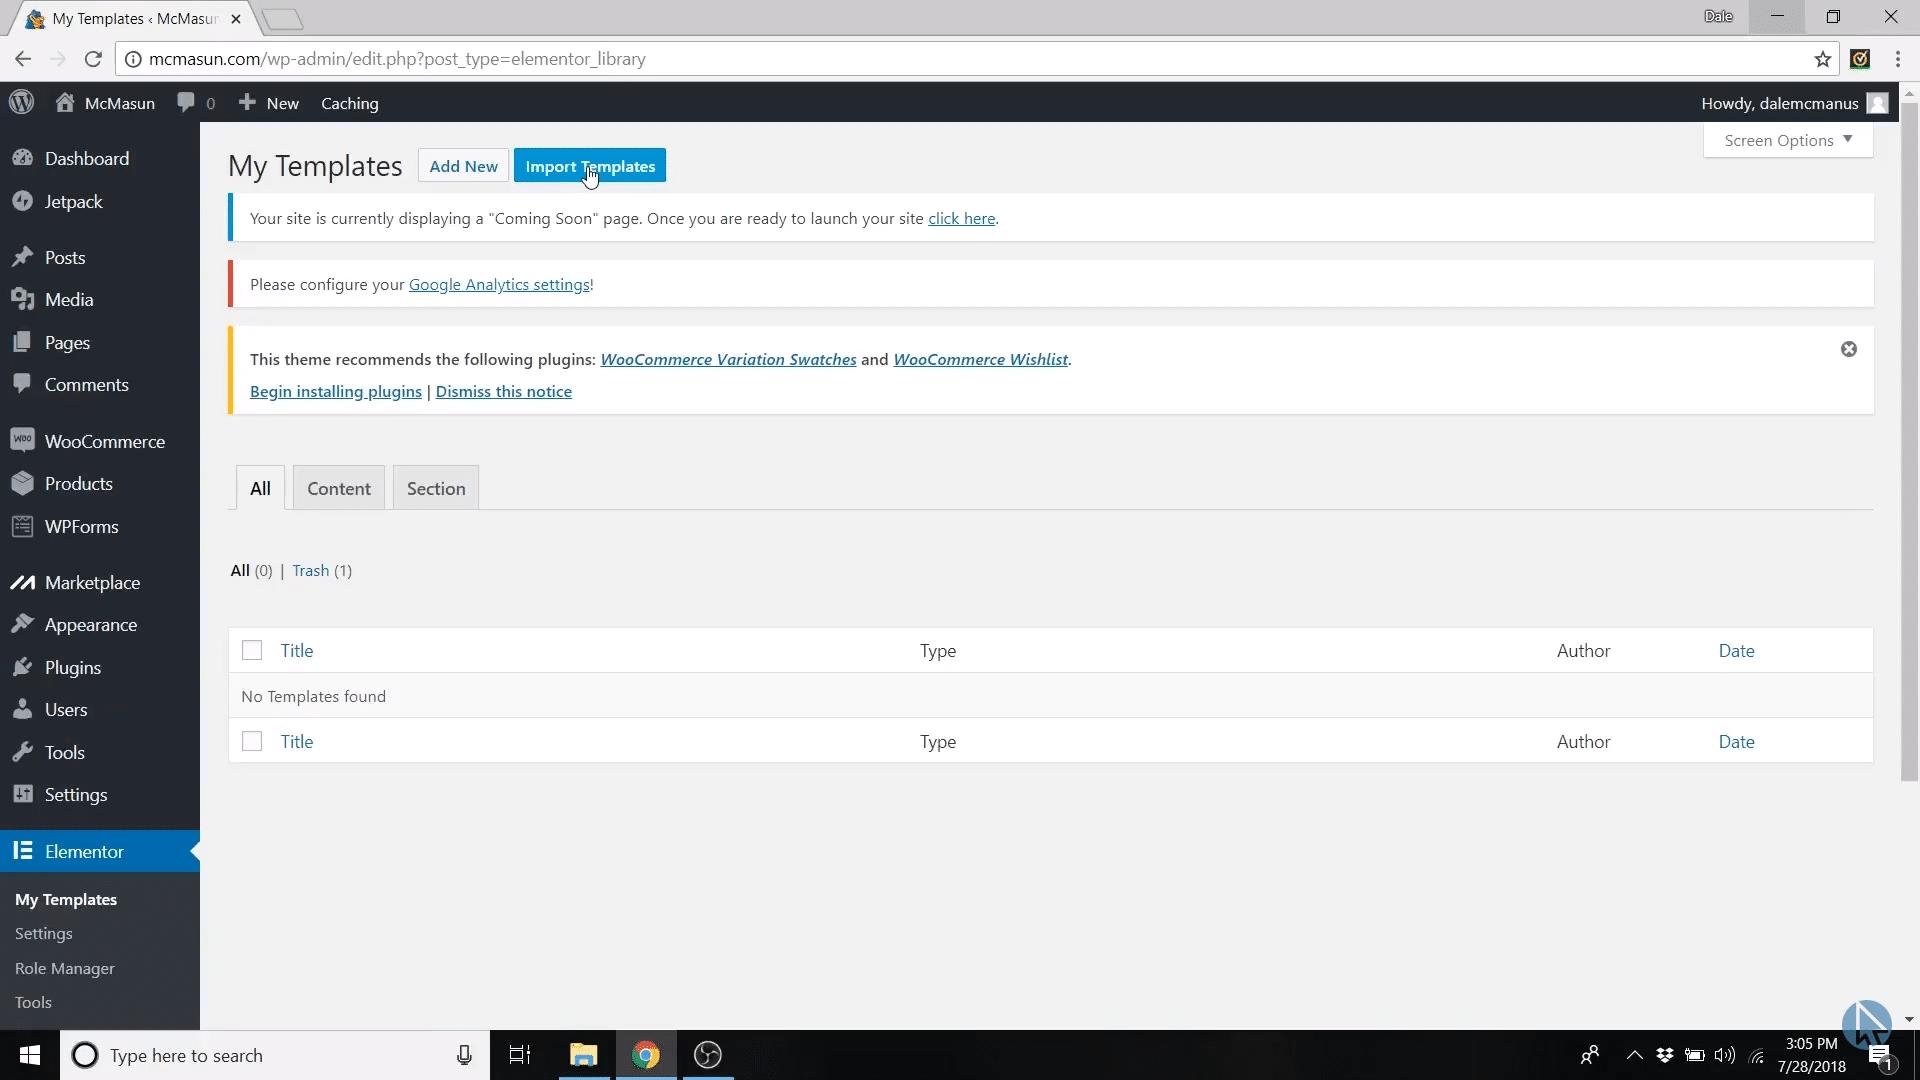 elementor import templates